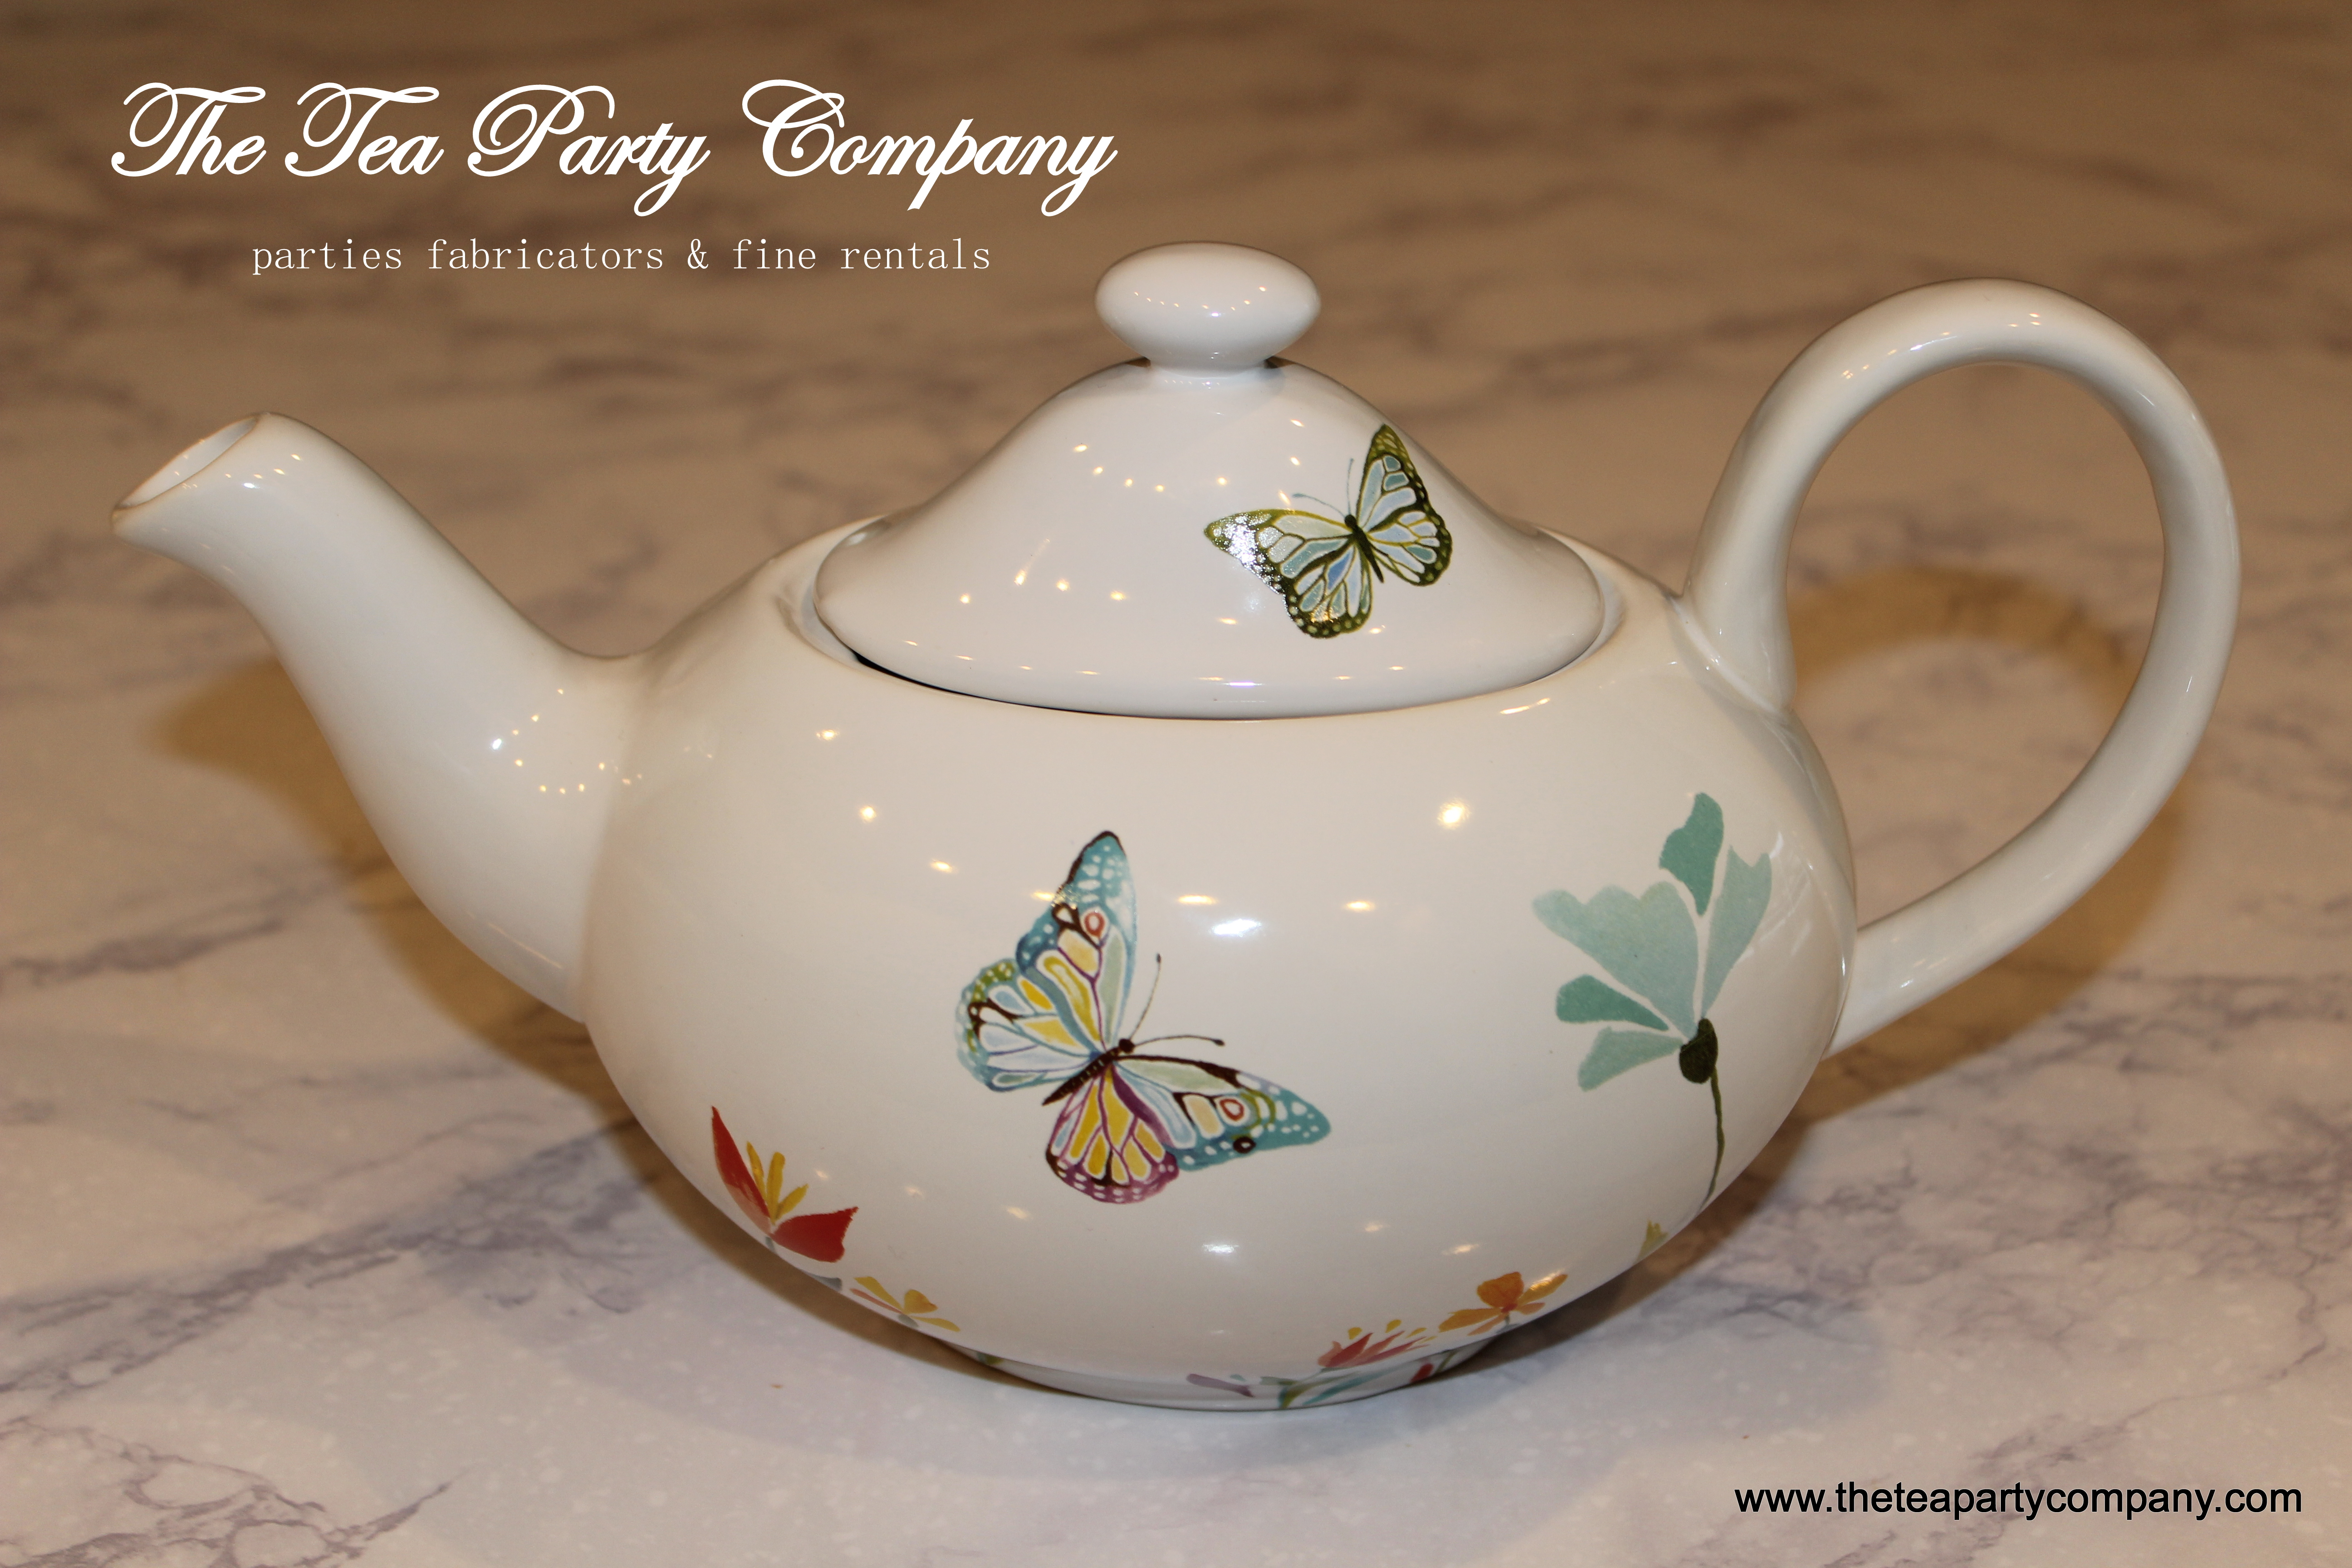 Mismatch Tea Pots The Tea Party Company (5)